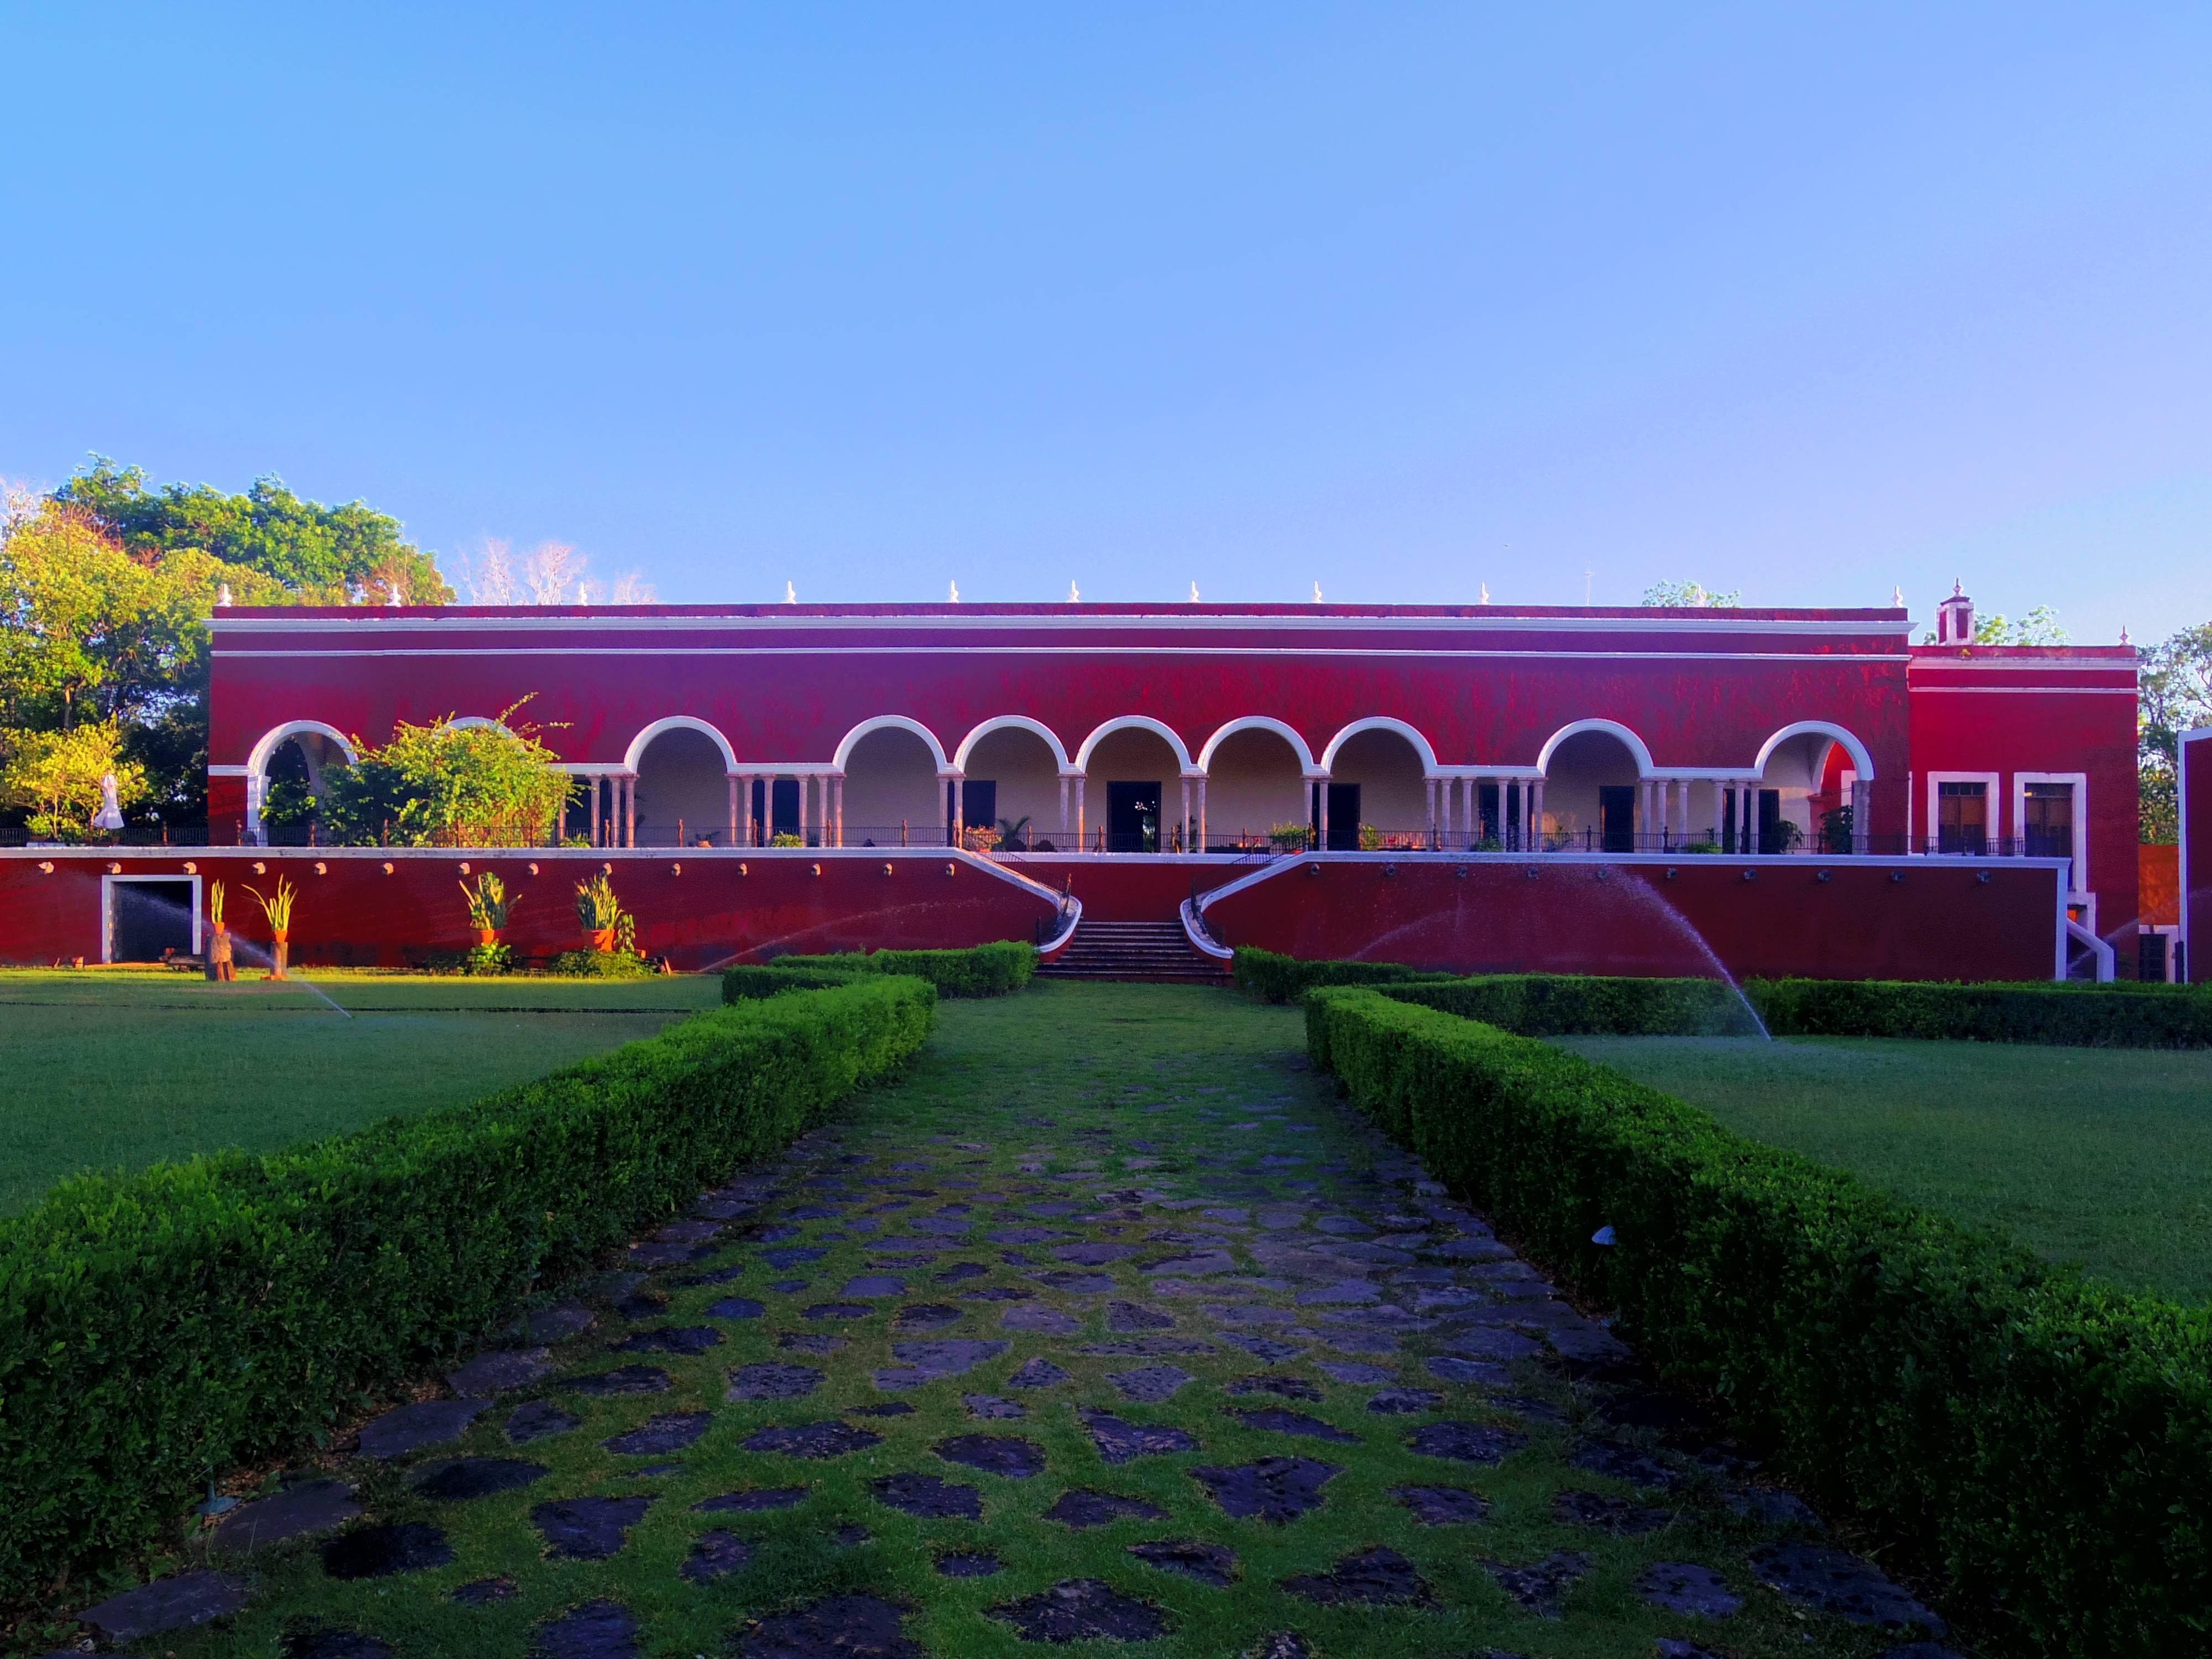 Photo 1: Hacienda Temozon, un petit coin de paradis